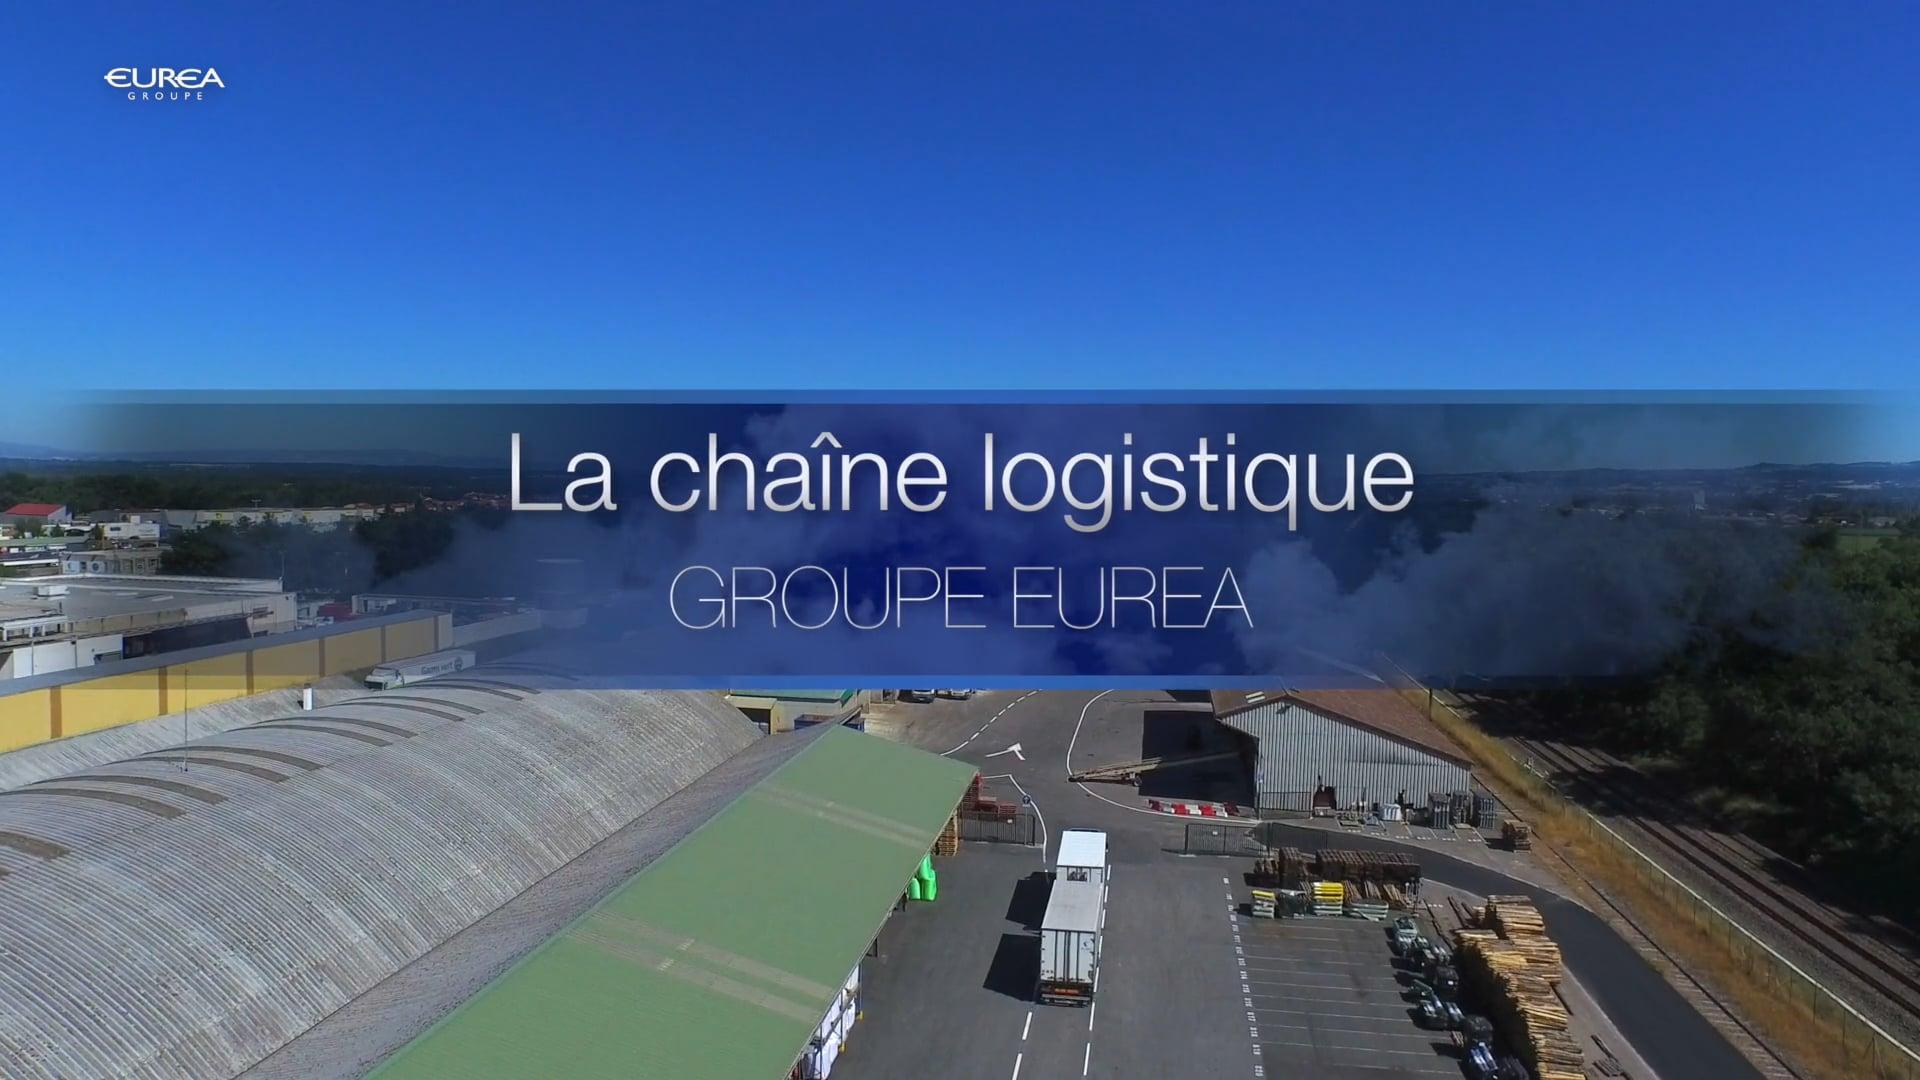 CHAINE LOGISTIQUE GROUPE EUREA 2015